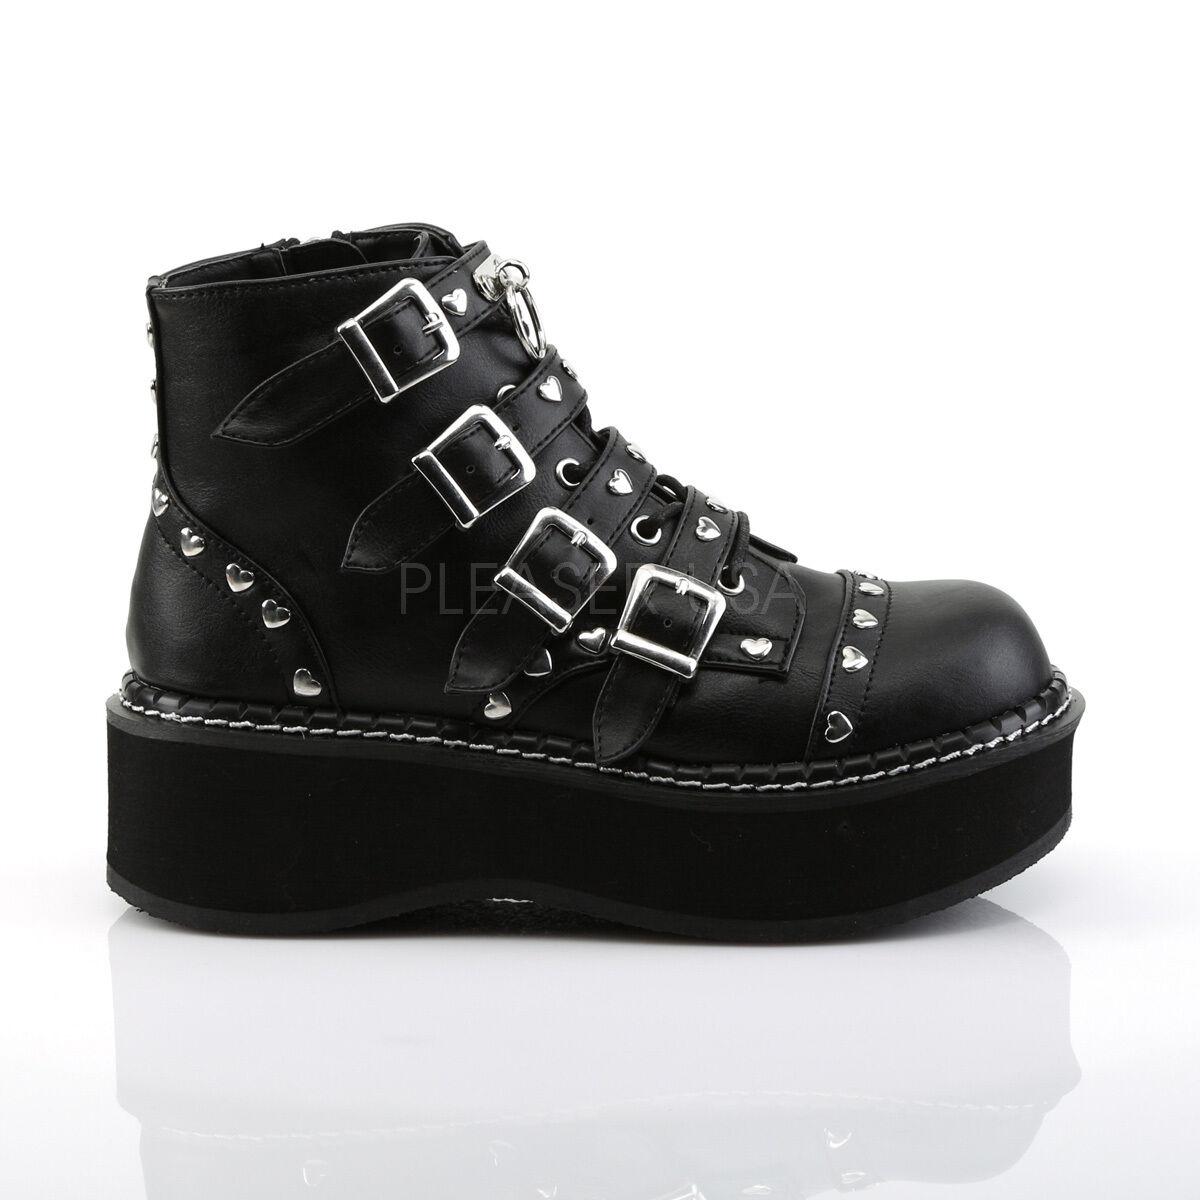 Demonia Negro Vegano Hebilla 2 Plataforma Zapatos Zapatos Plataforma Punk Goth MJ corazón con tachas 6-12 36d02d